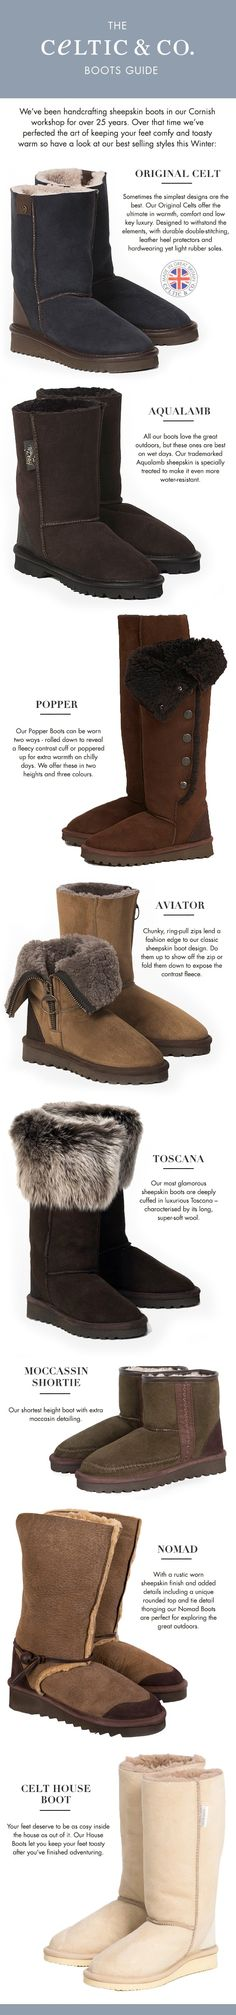 cornish ugg style boots